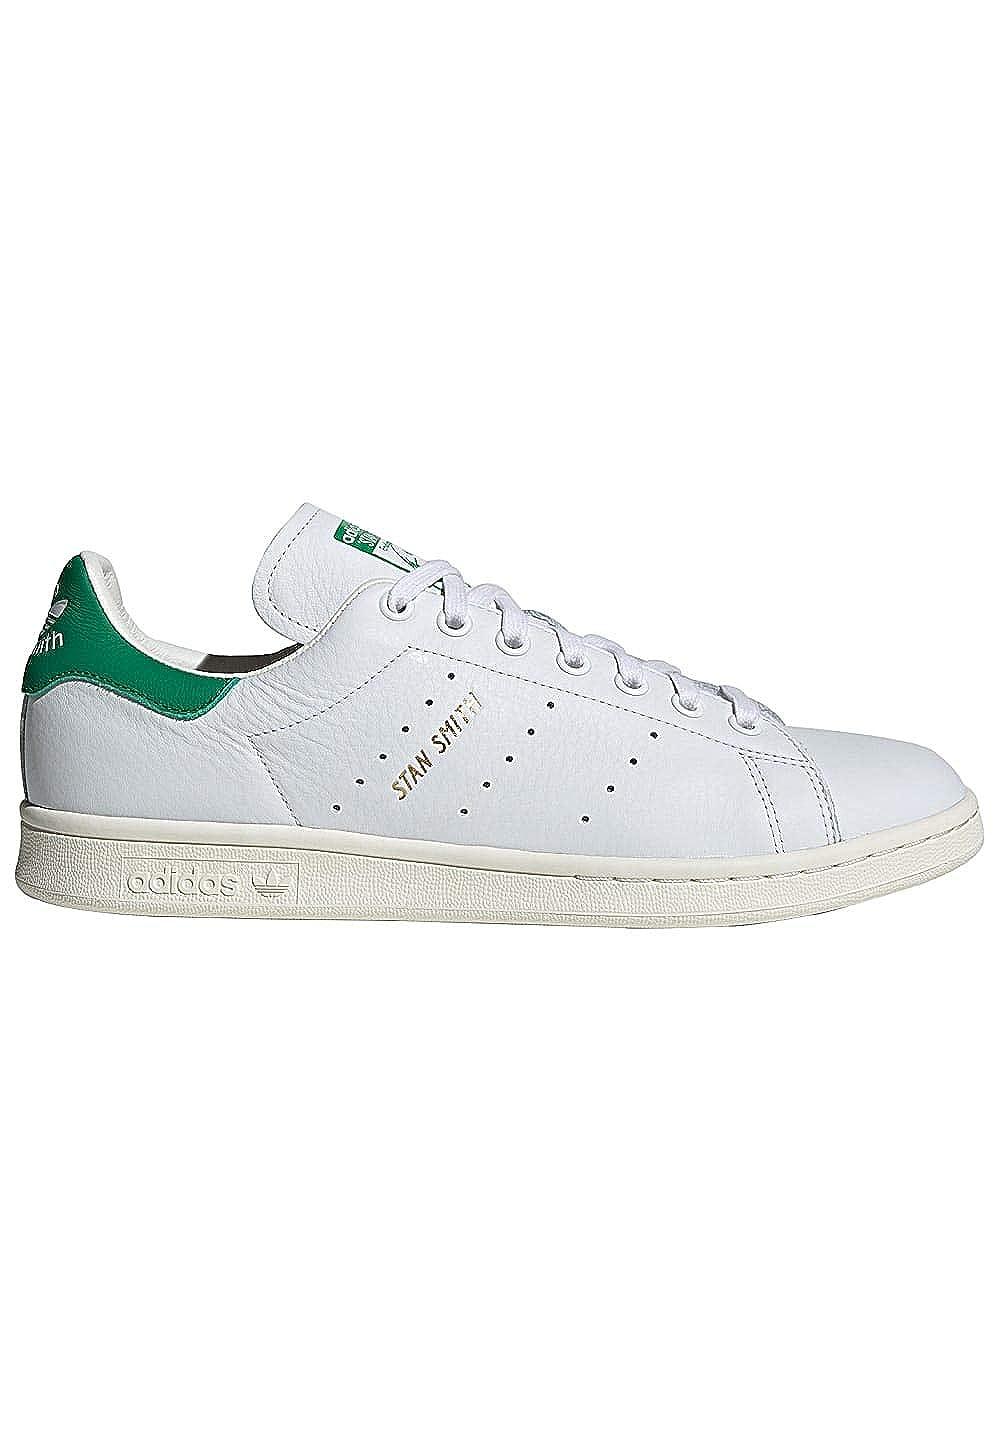 costo scarpe adidas stan smith